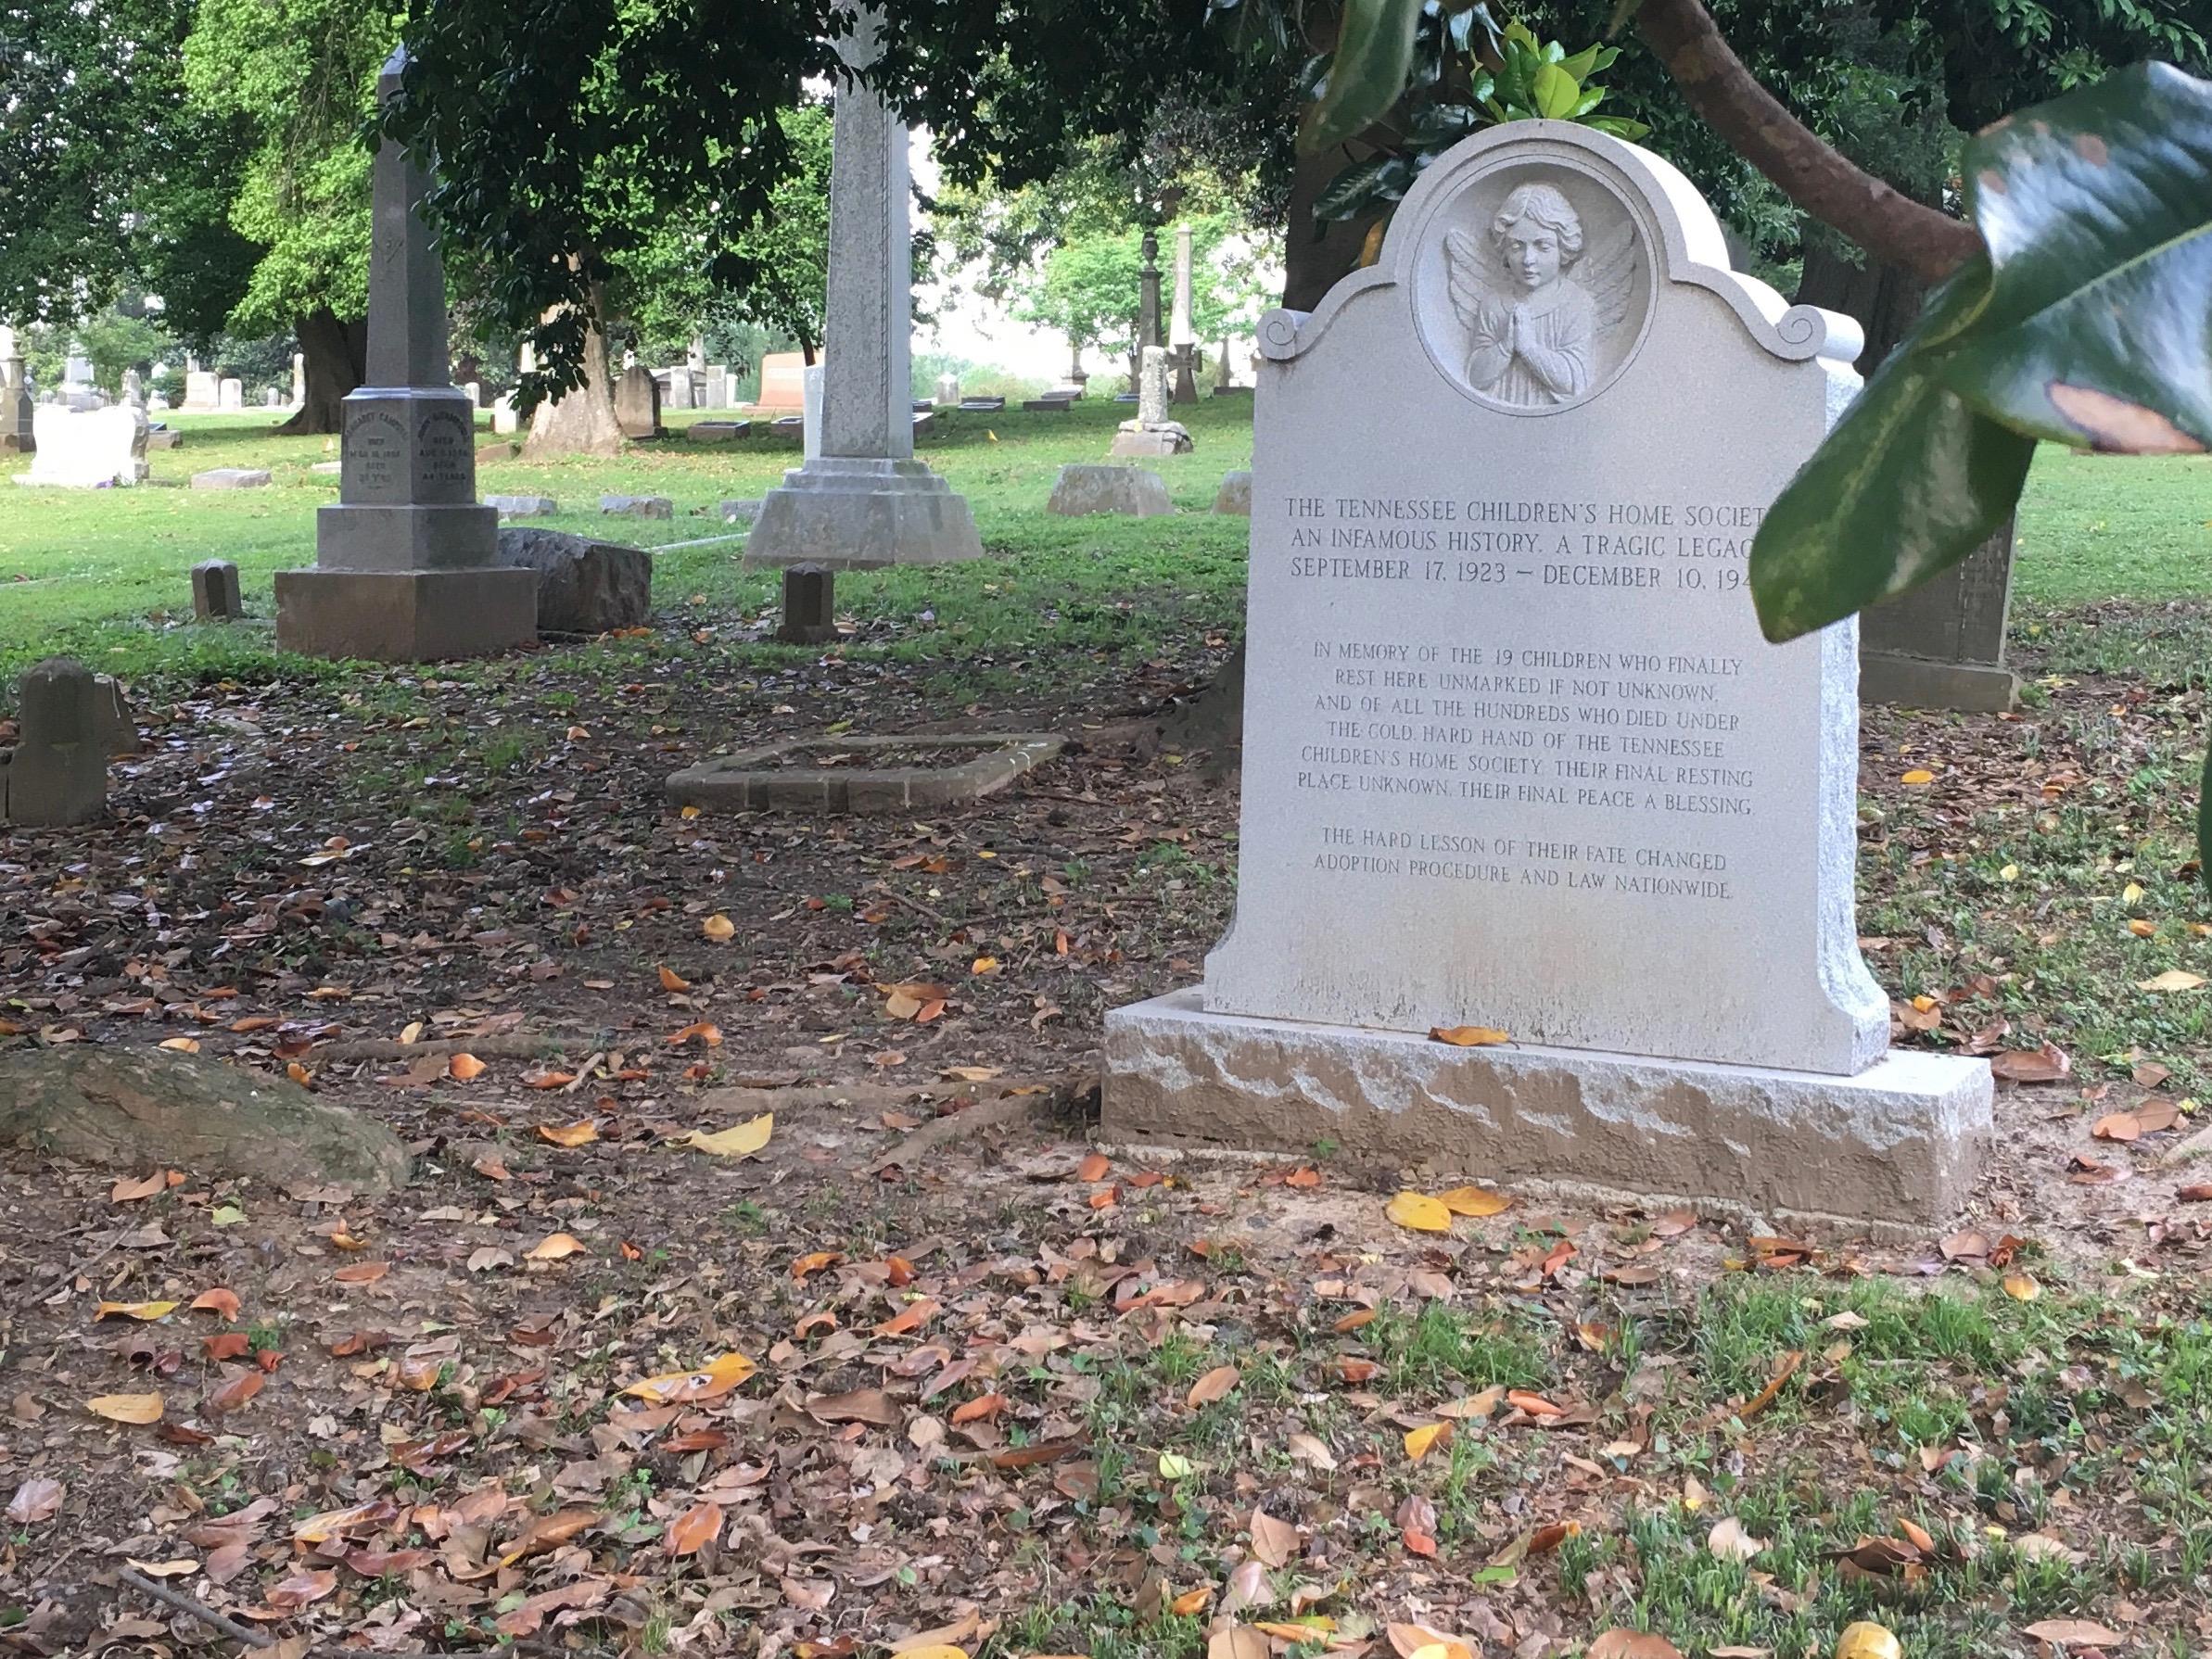 File:Tennessee Children's Home Society Memorial Marker, Elmwood Cemetery,  Memphis, 2015.jpg - Wikimedia Commons